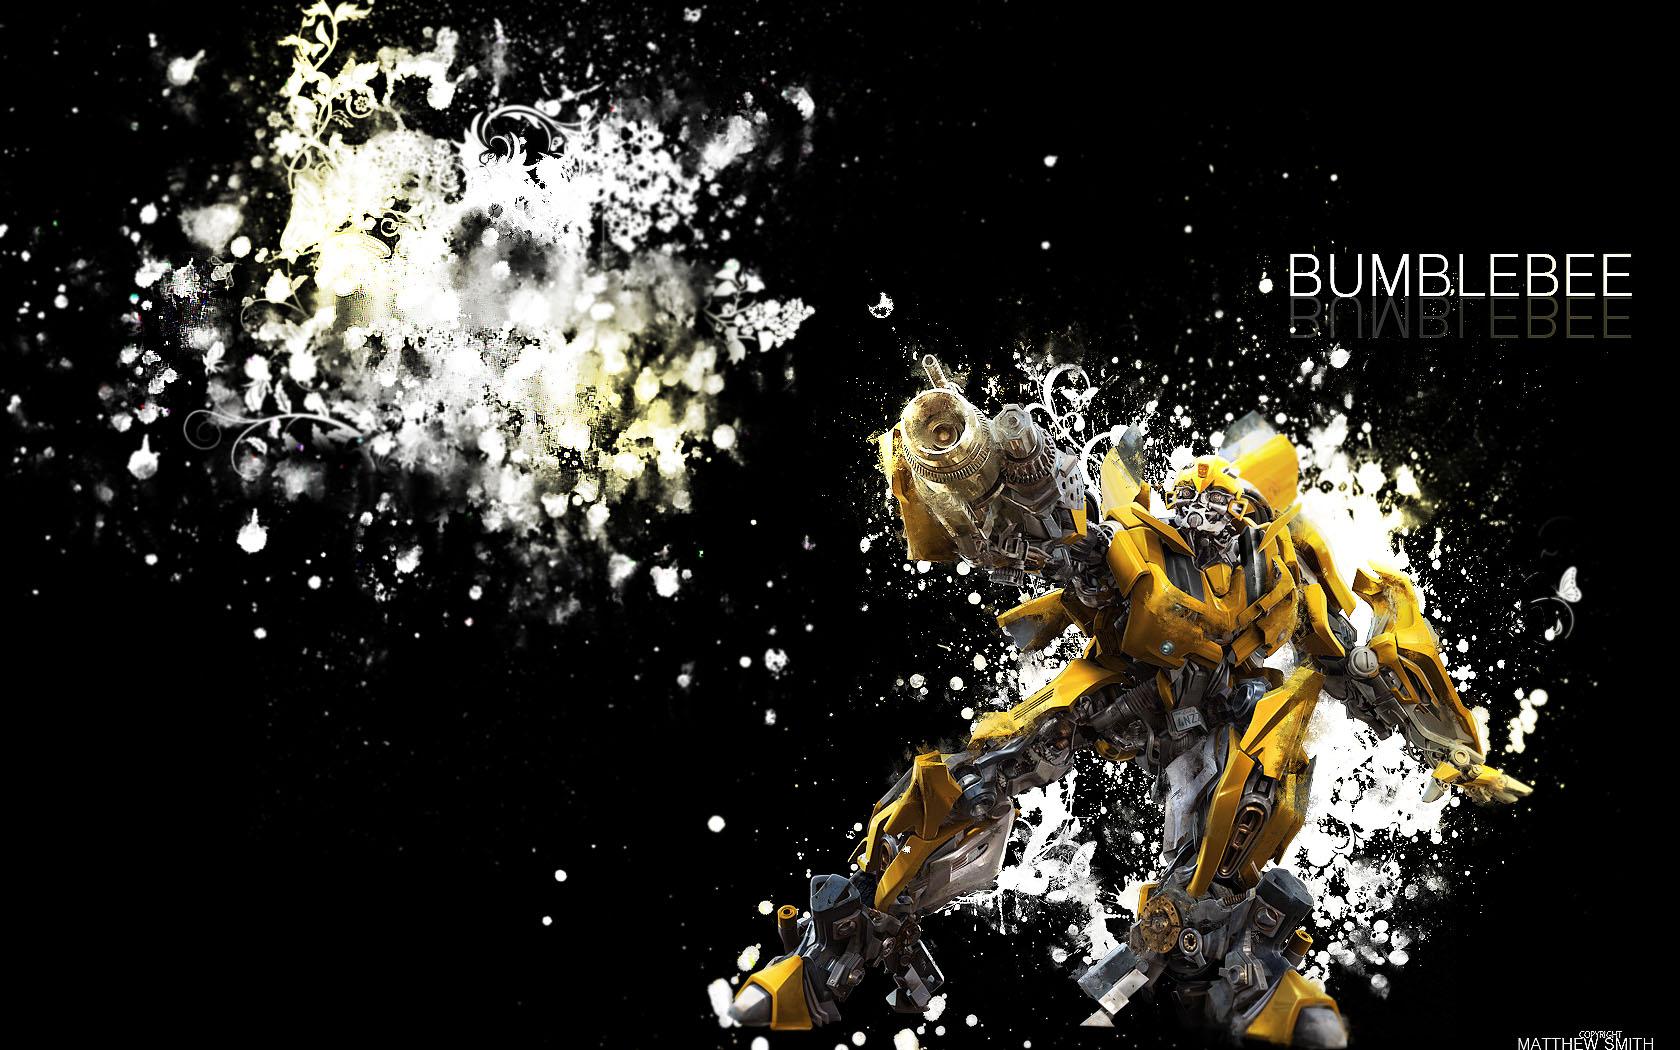 bumblebee wallpaper 1680x050 by unique2892 on deviantart